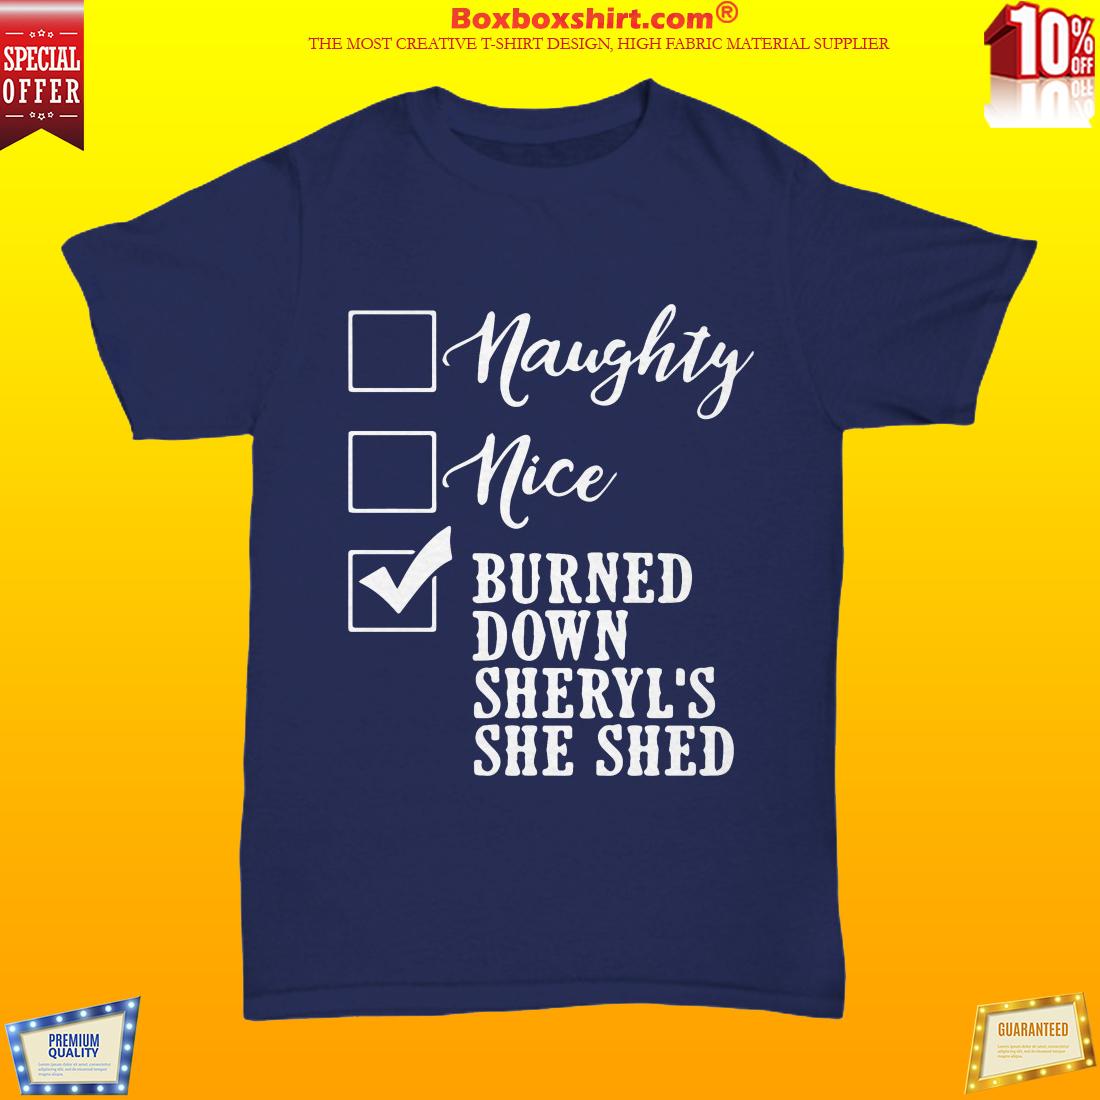 Naughty nice burned down sheryl's she shed shirt and hoodies